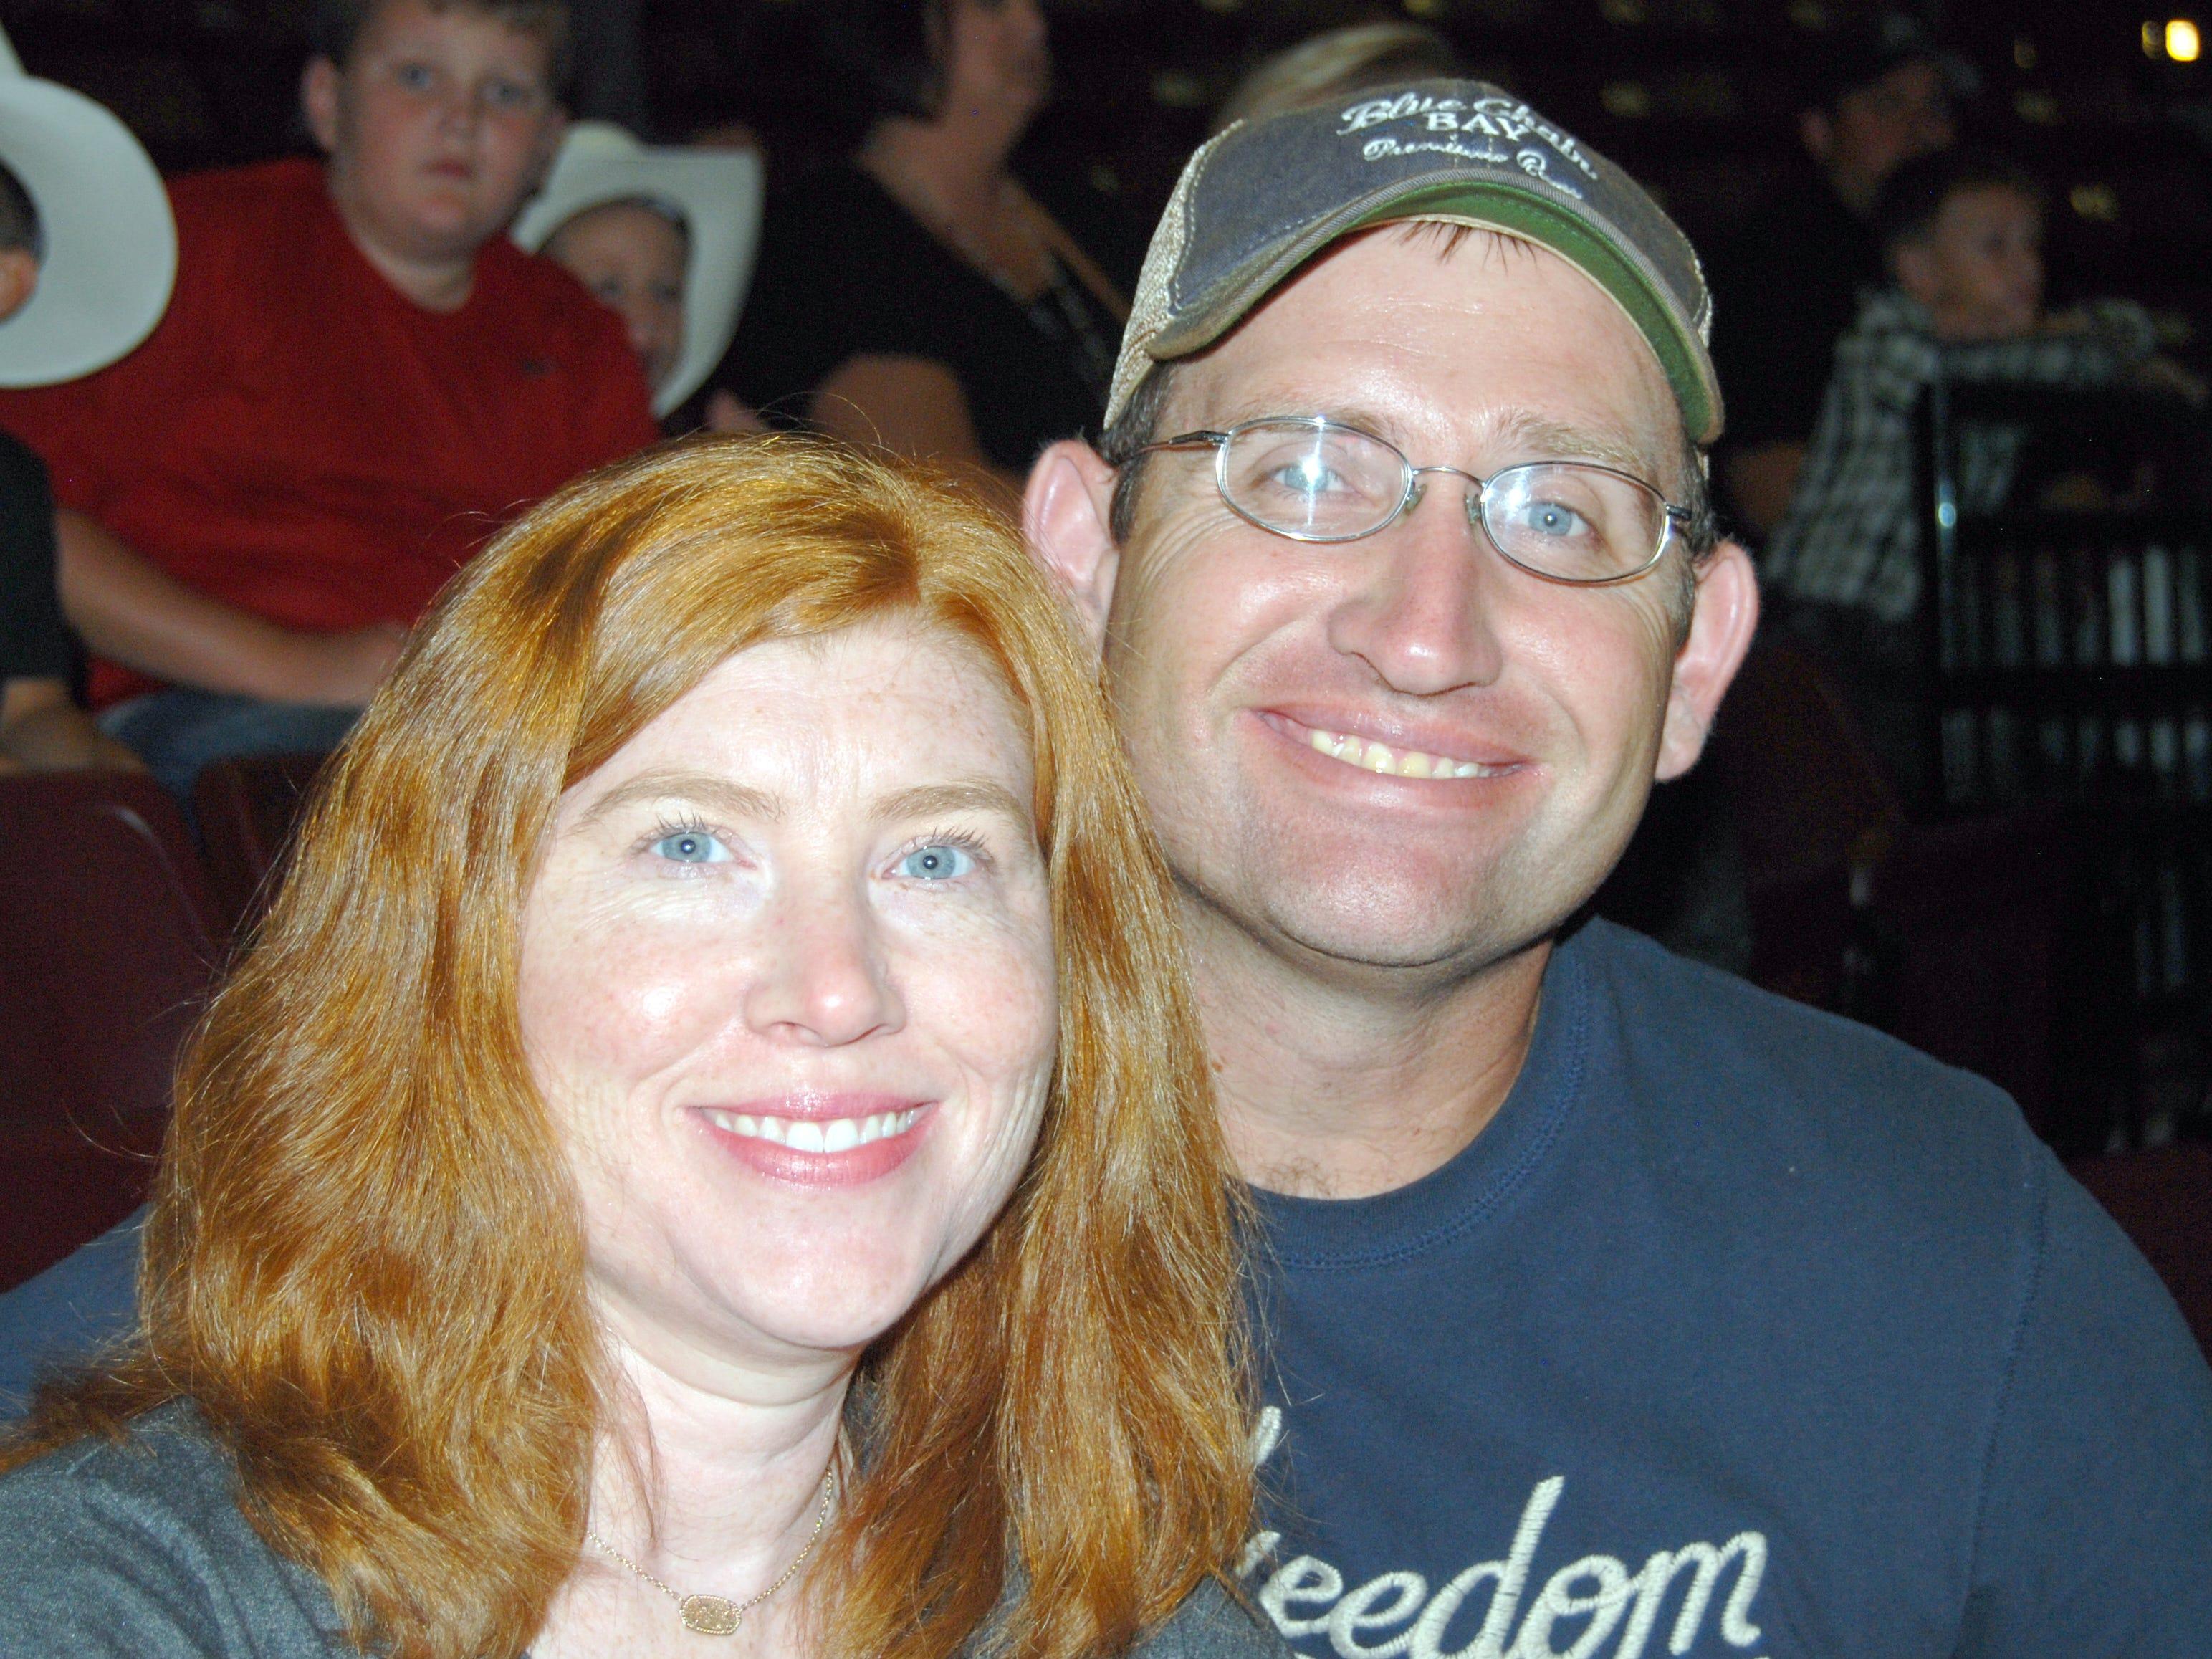 Erin and Brian Berendzen